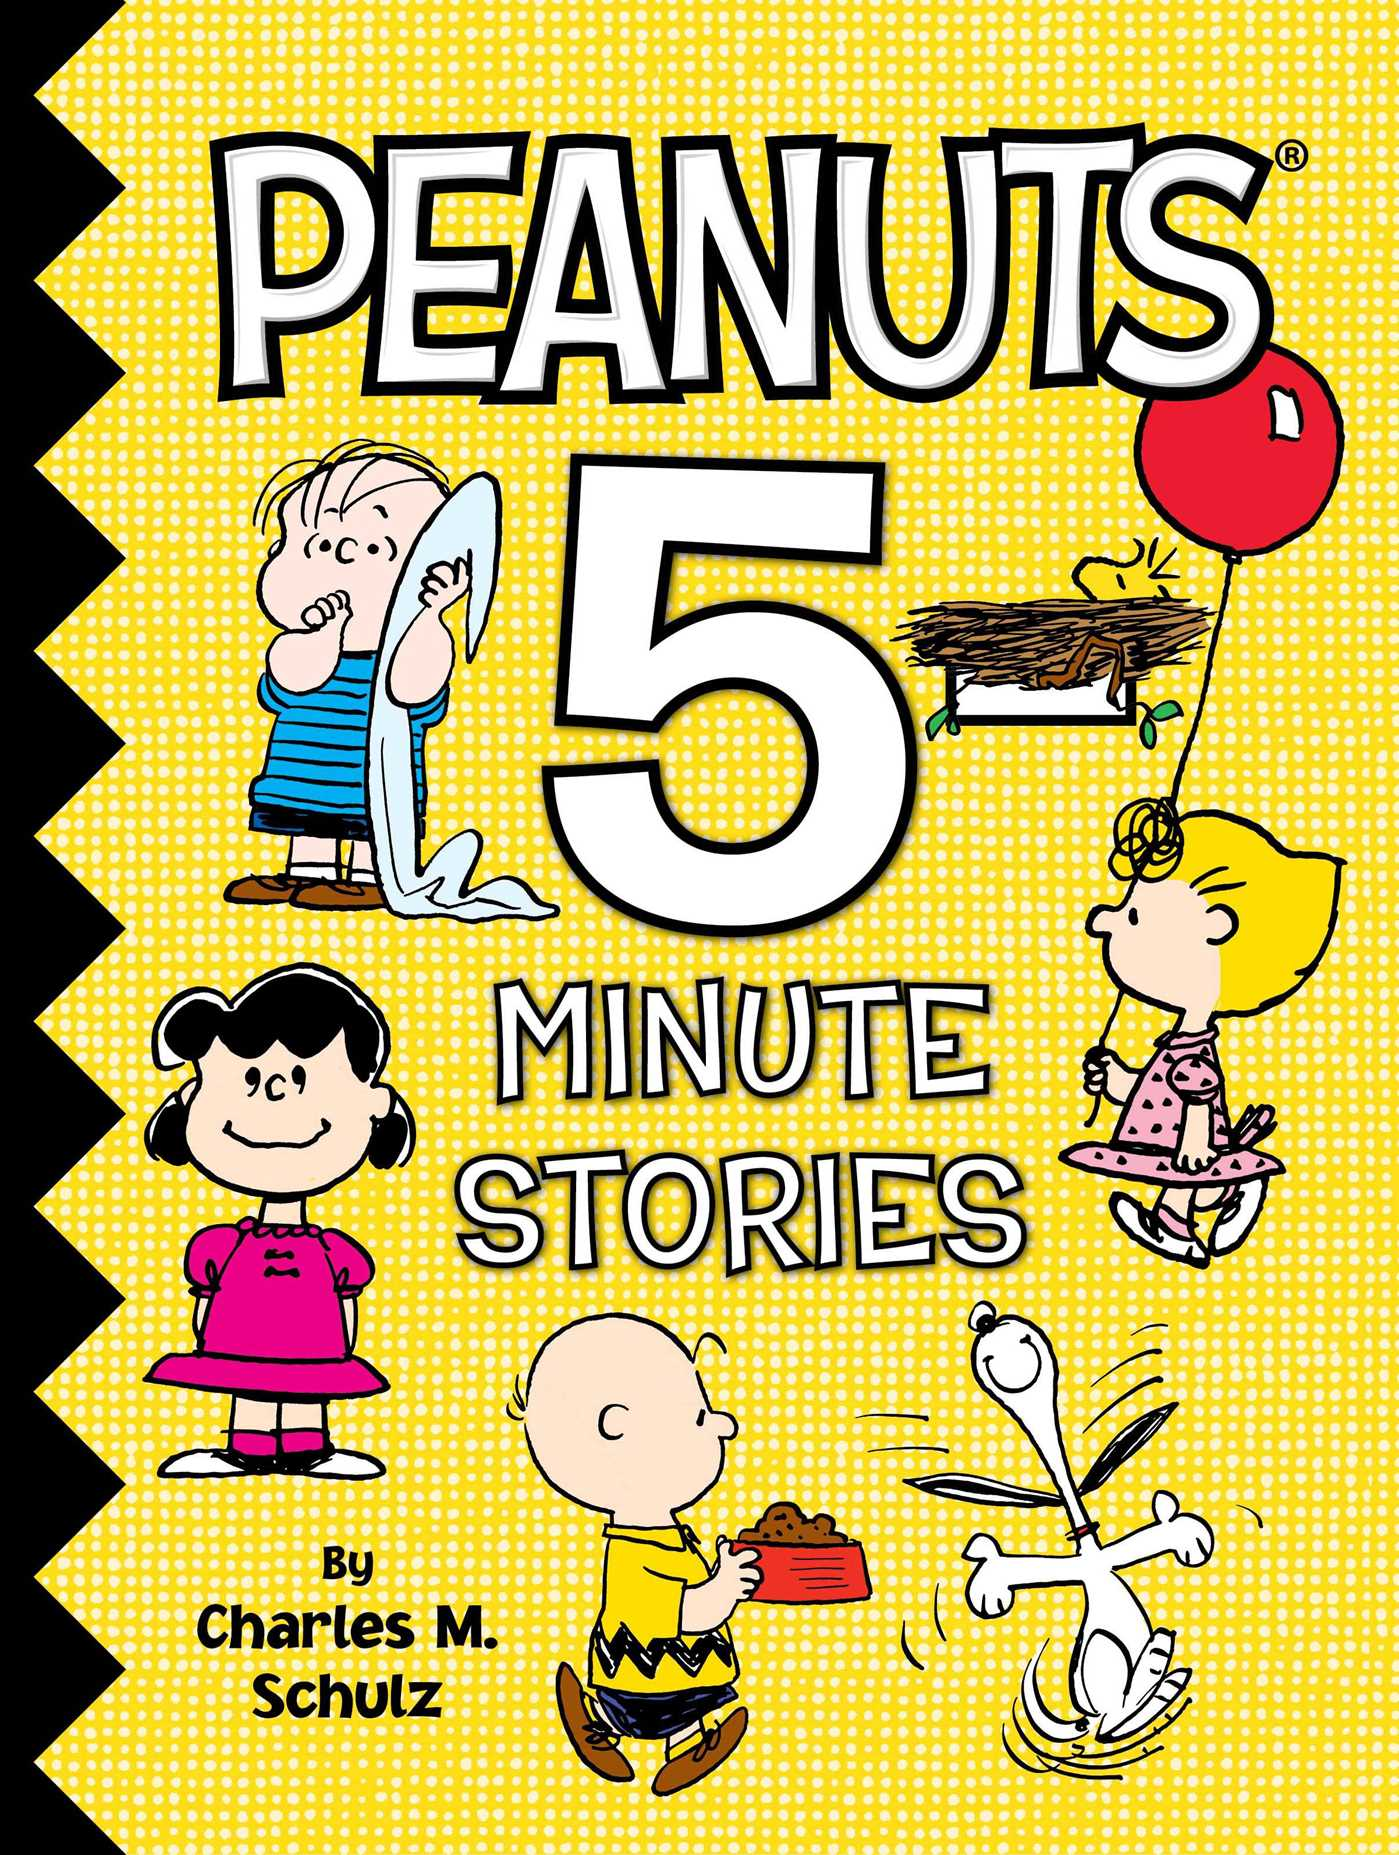 Peanuts 5 minute stories 9781534411623 hr